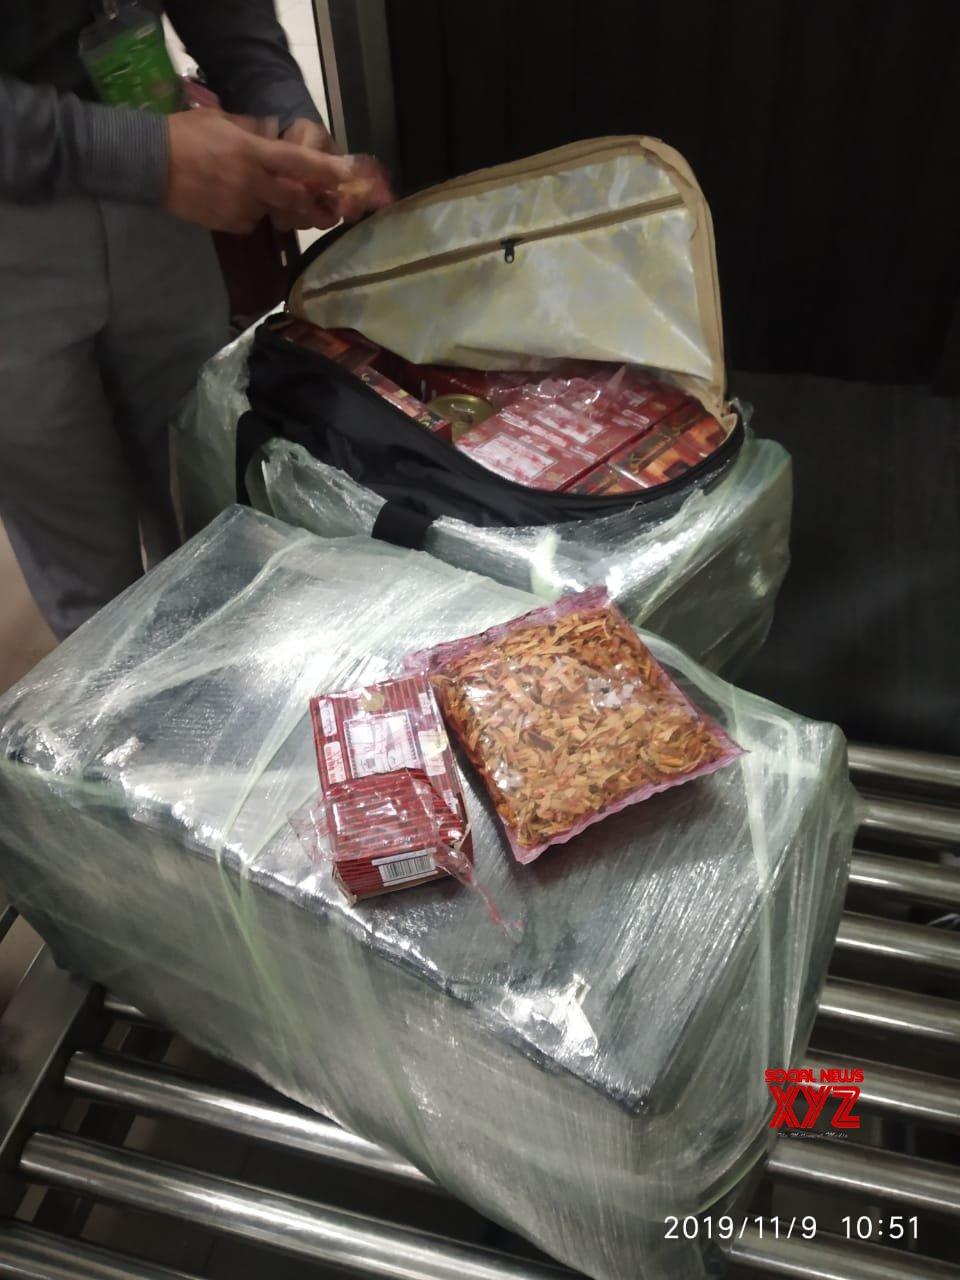 Hyderabad: CISF apprehended 44 kg sandalwood #Gallery